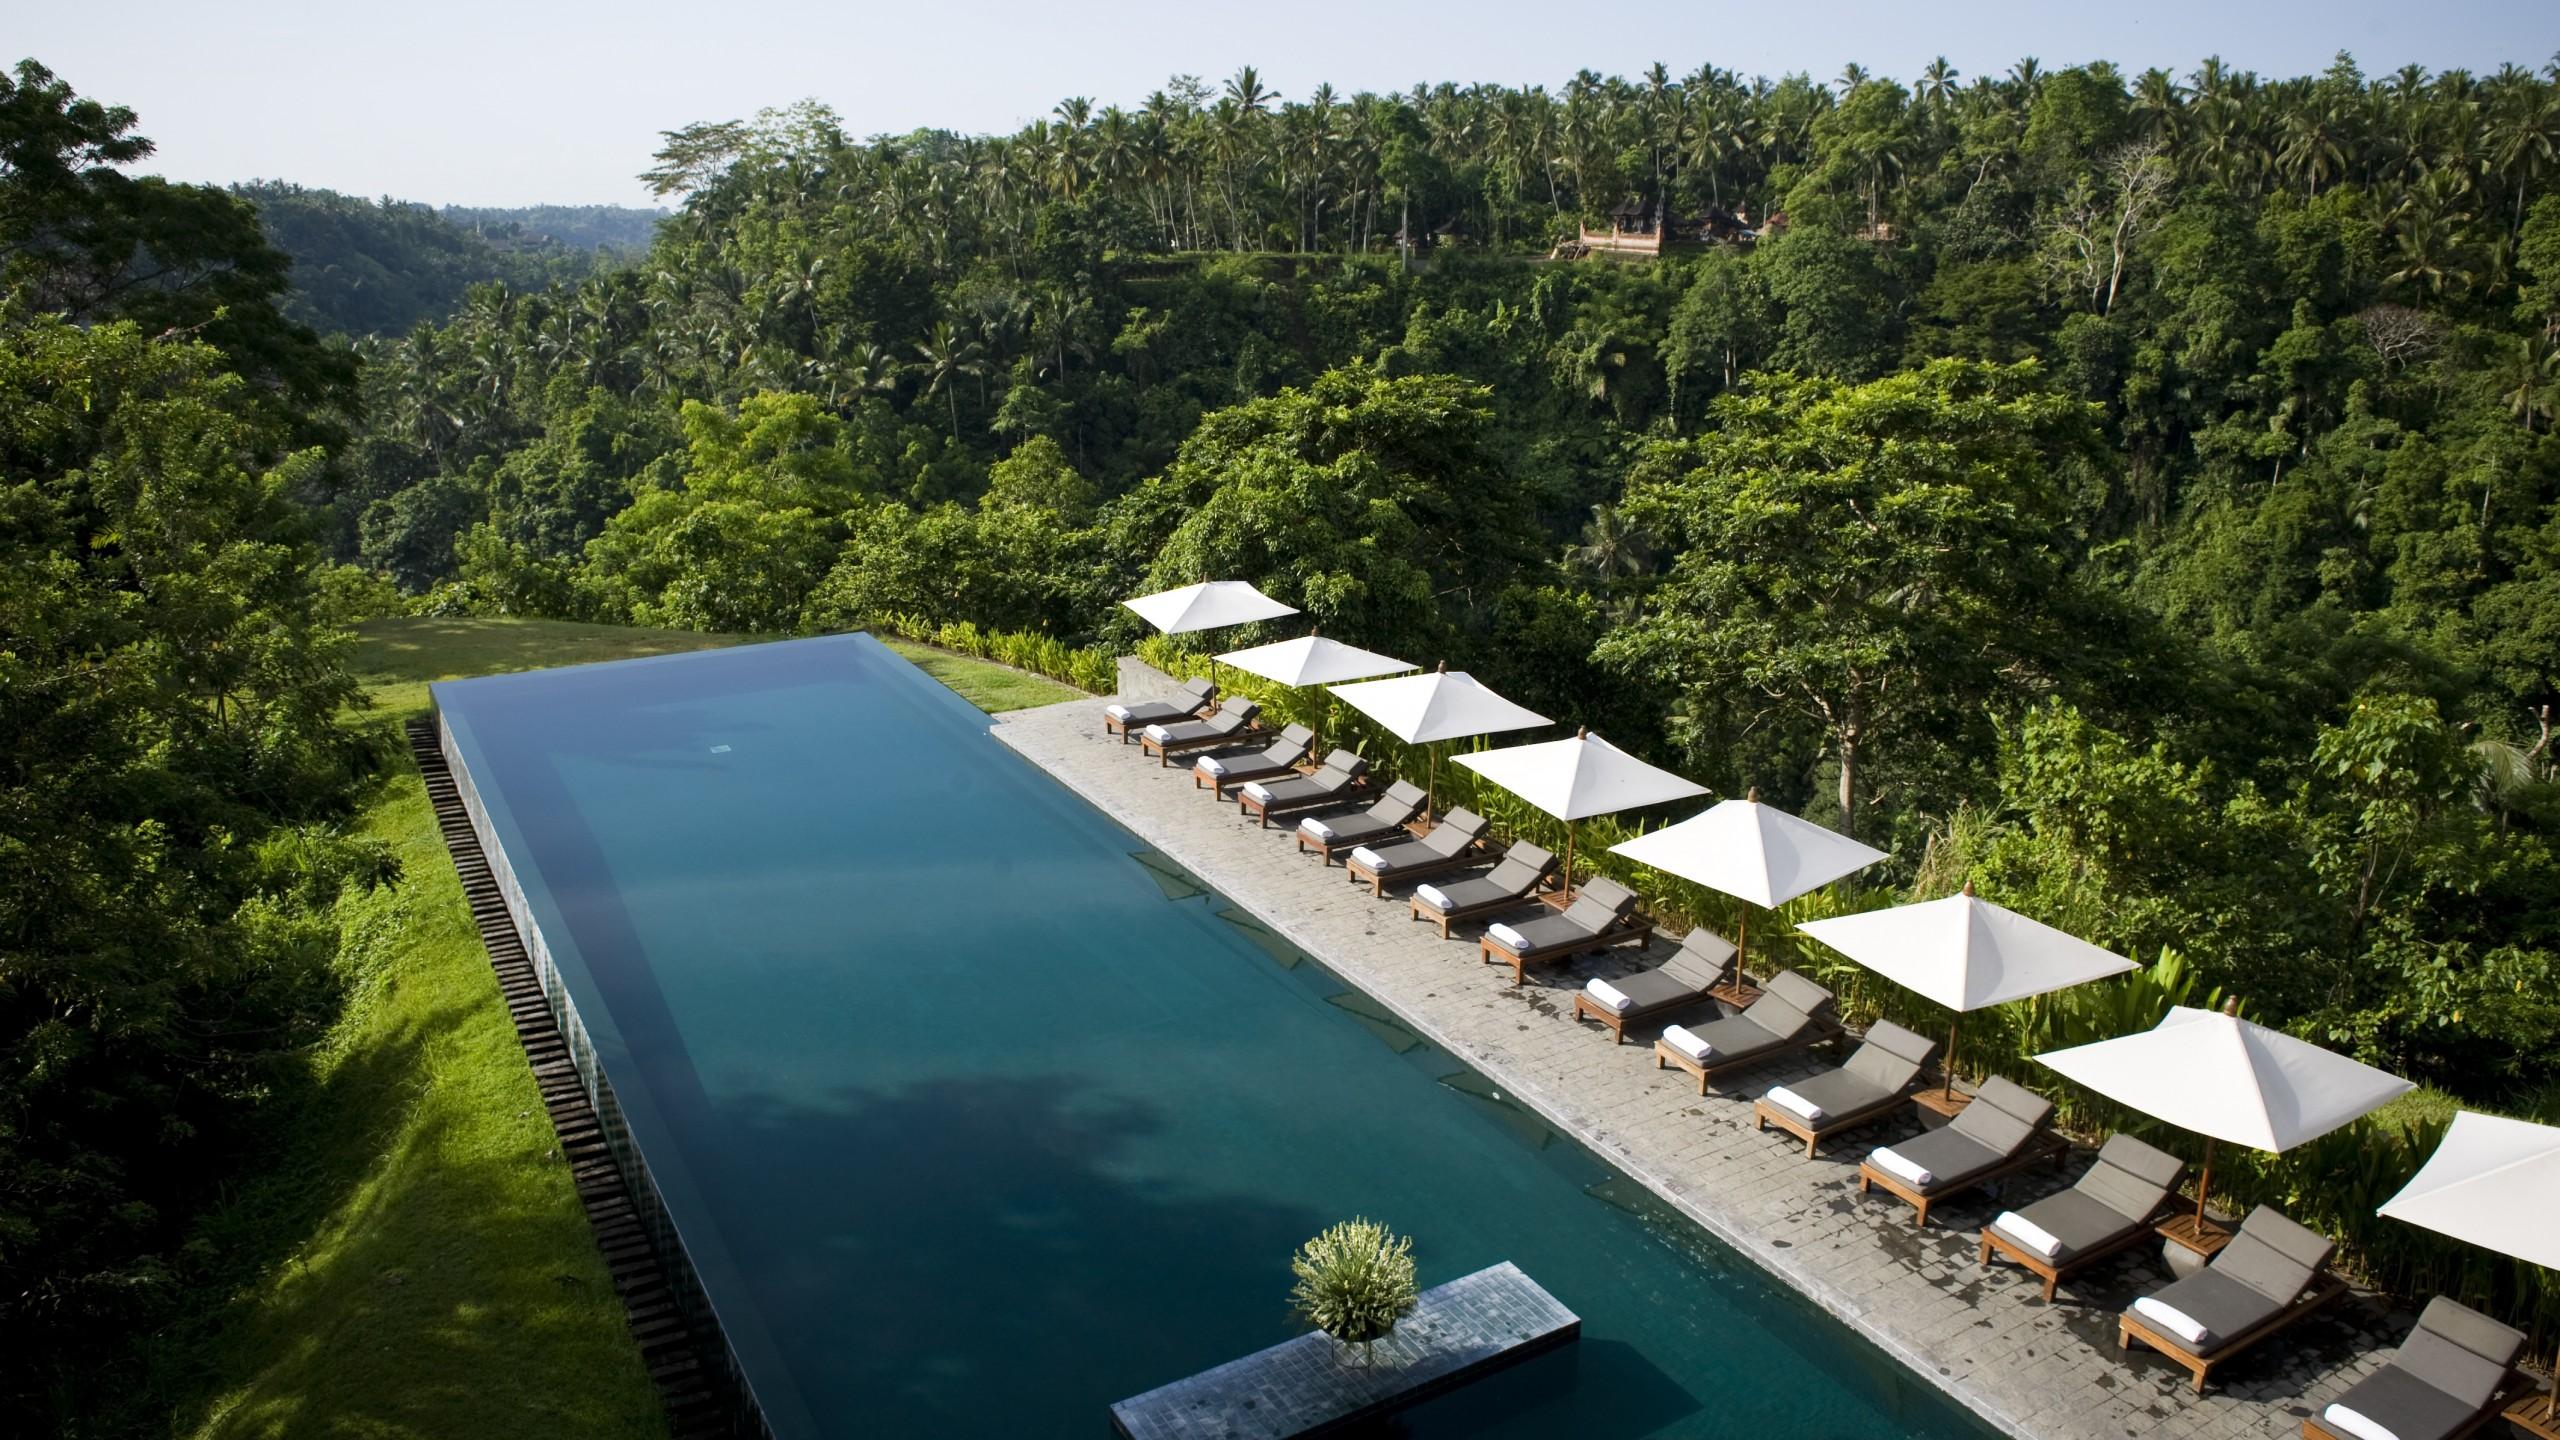 Wallpaper Alila Ubud Bali Indonesia The best hotel pools 2017 2560x1440